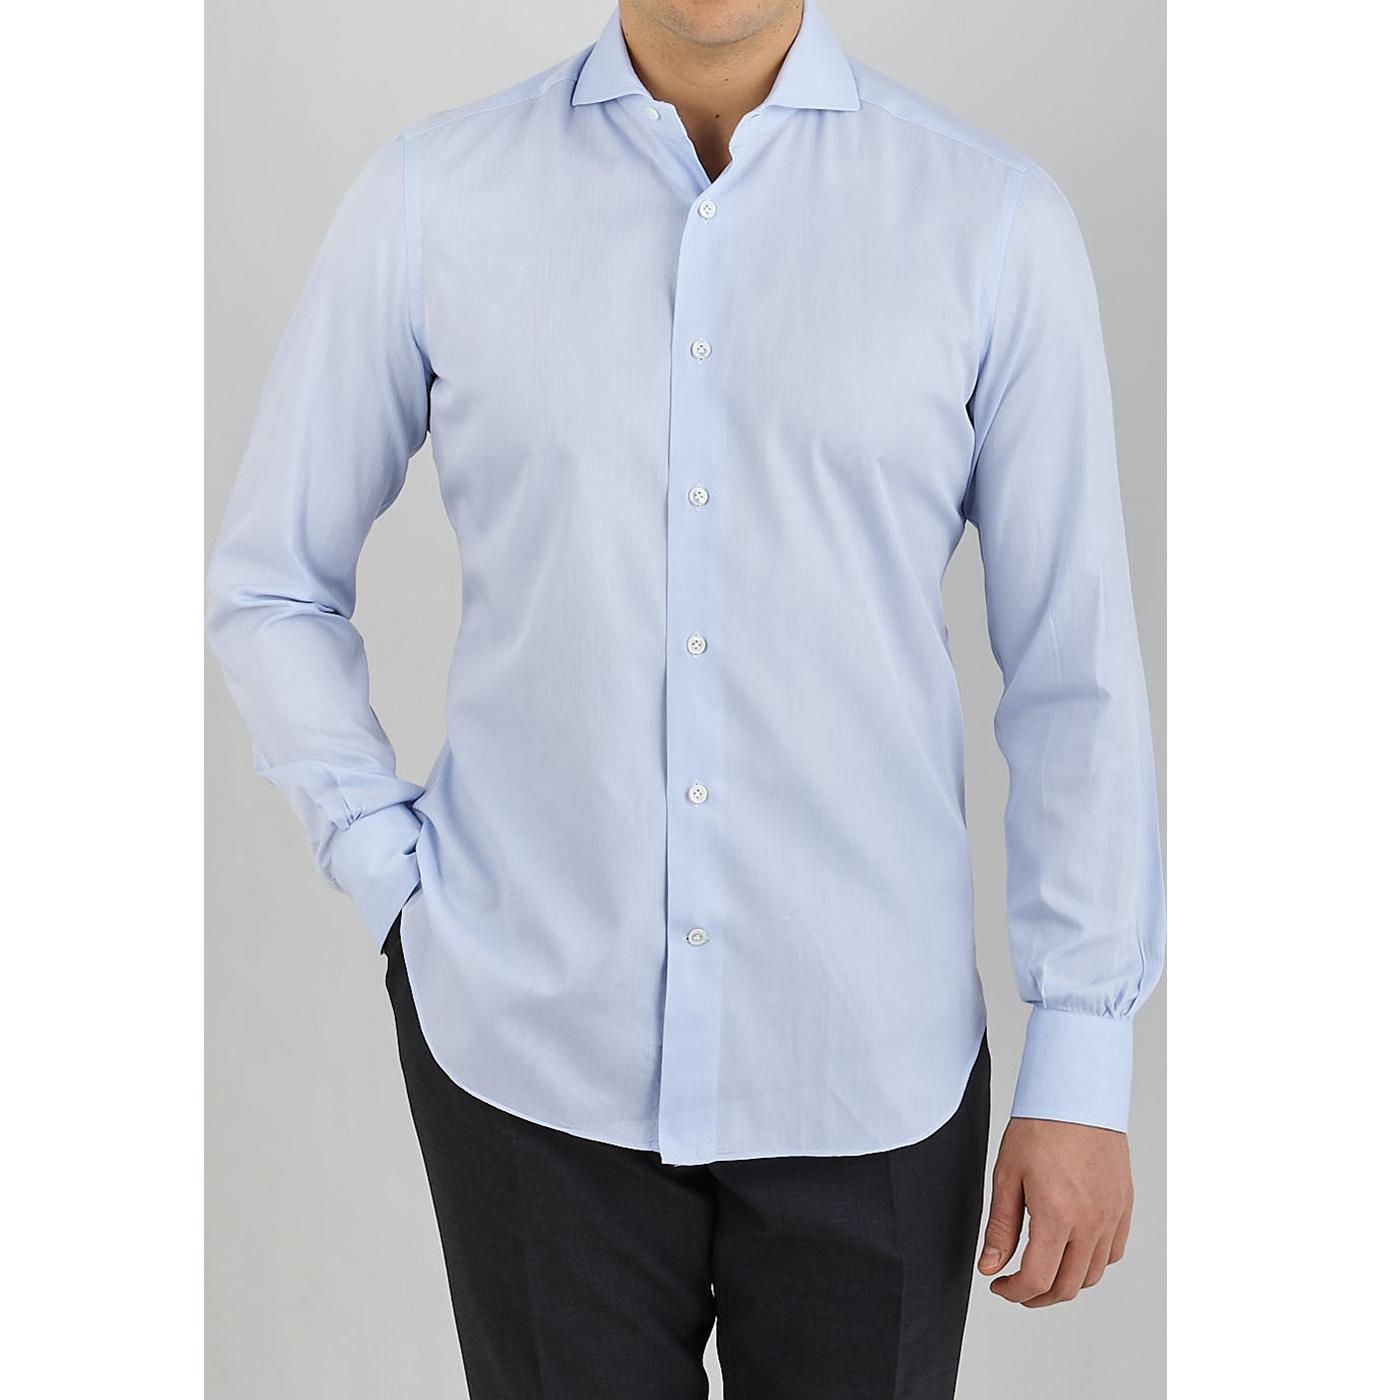 Mazzarelli Light Blue Slim Cutaway Herringbone Shirt Front